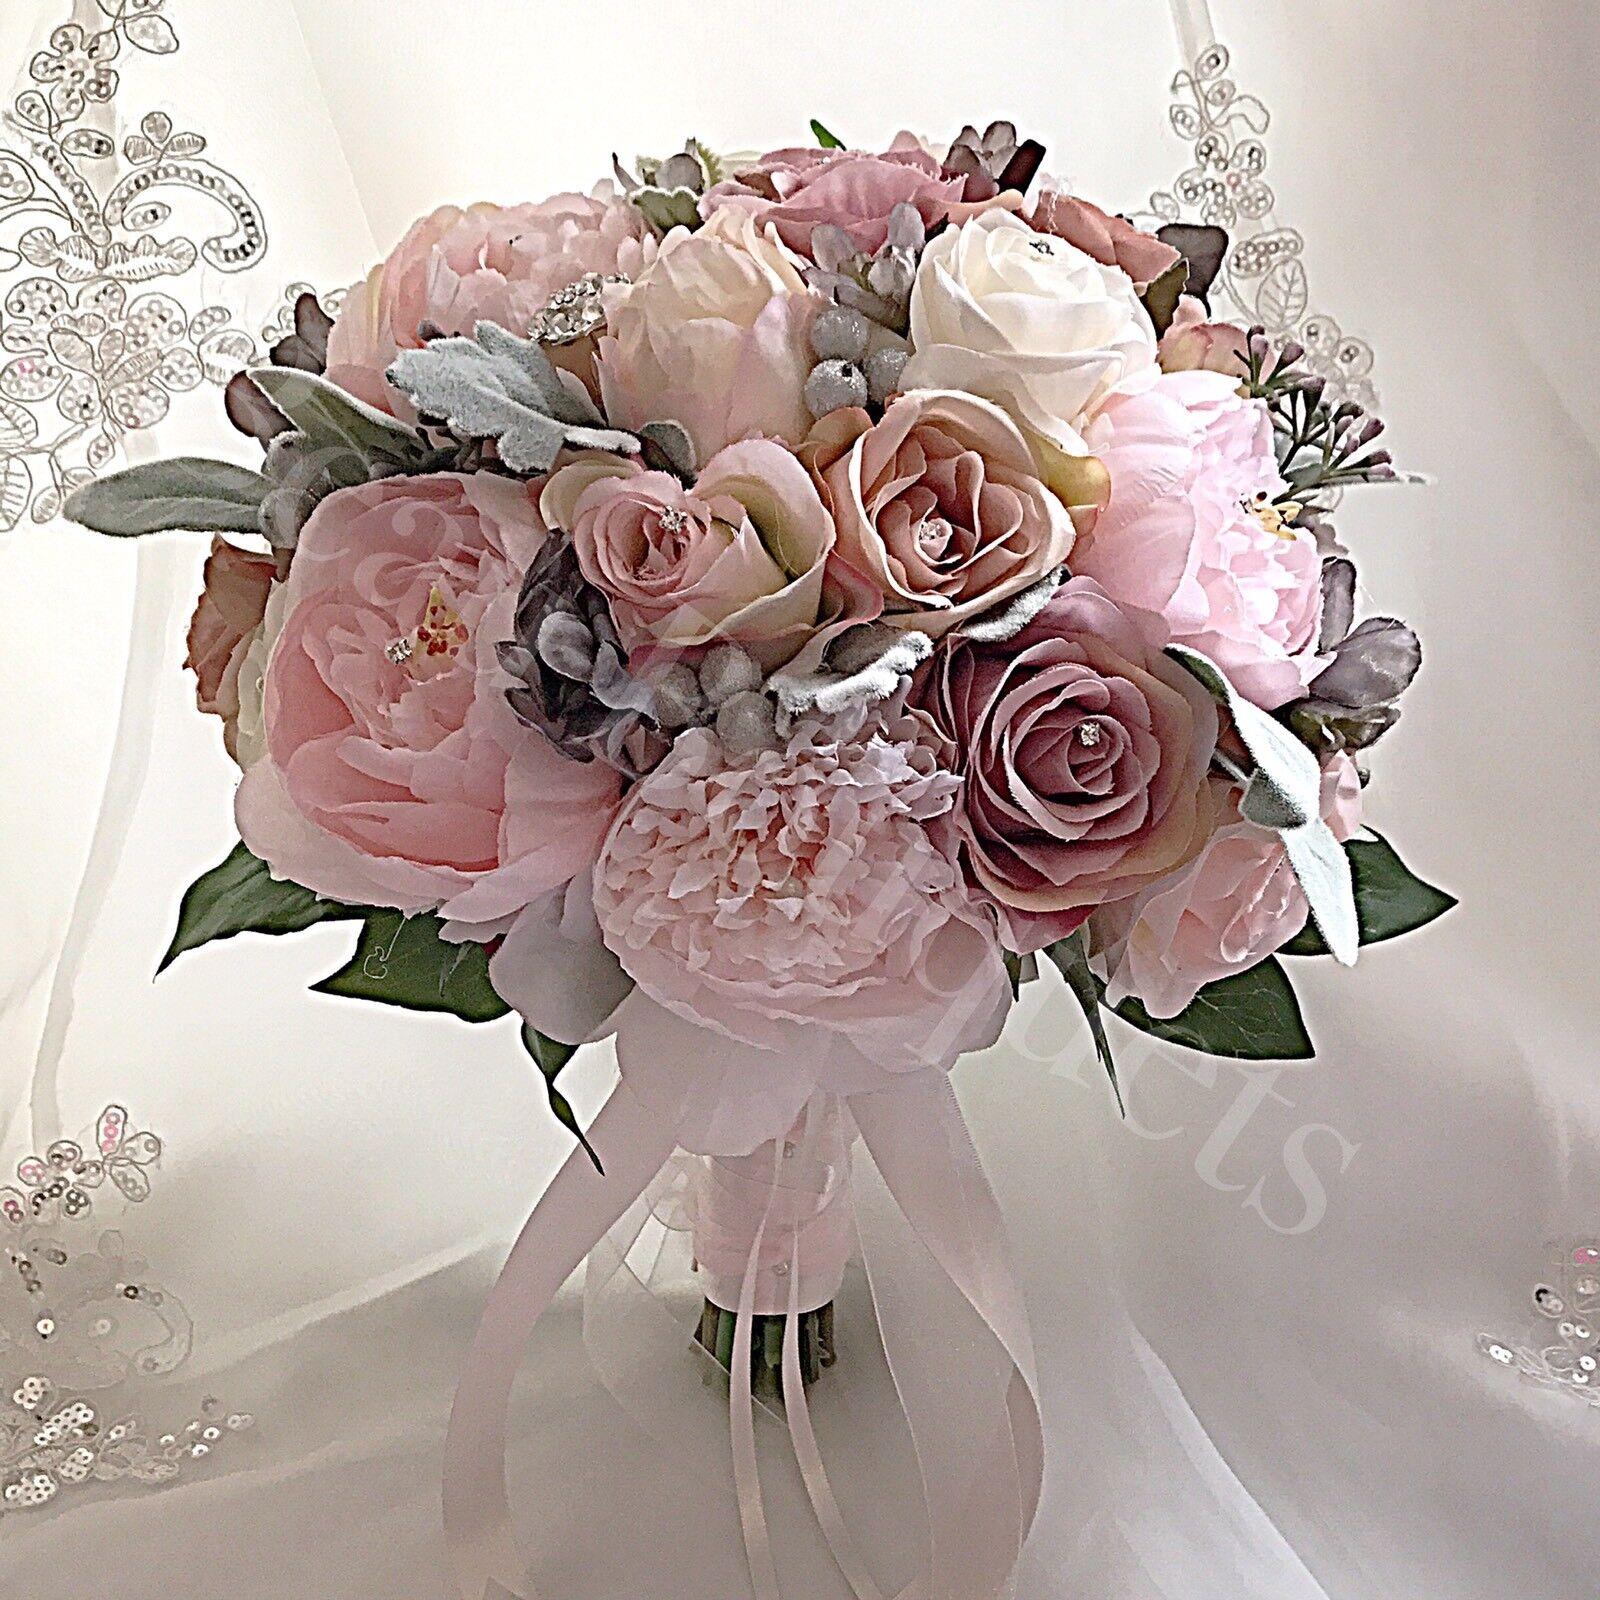 Wedding flowers vintage peony rose bride bouquet blush pink ivory wedding flowers vintage peony rose bride bouquet blush pink ivory grey mightylinksfo